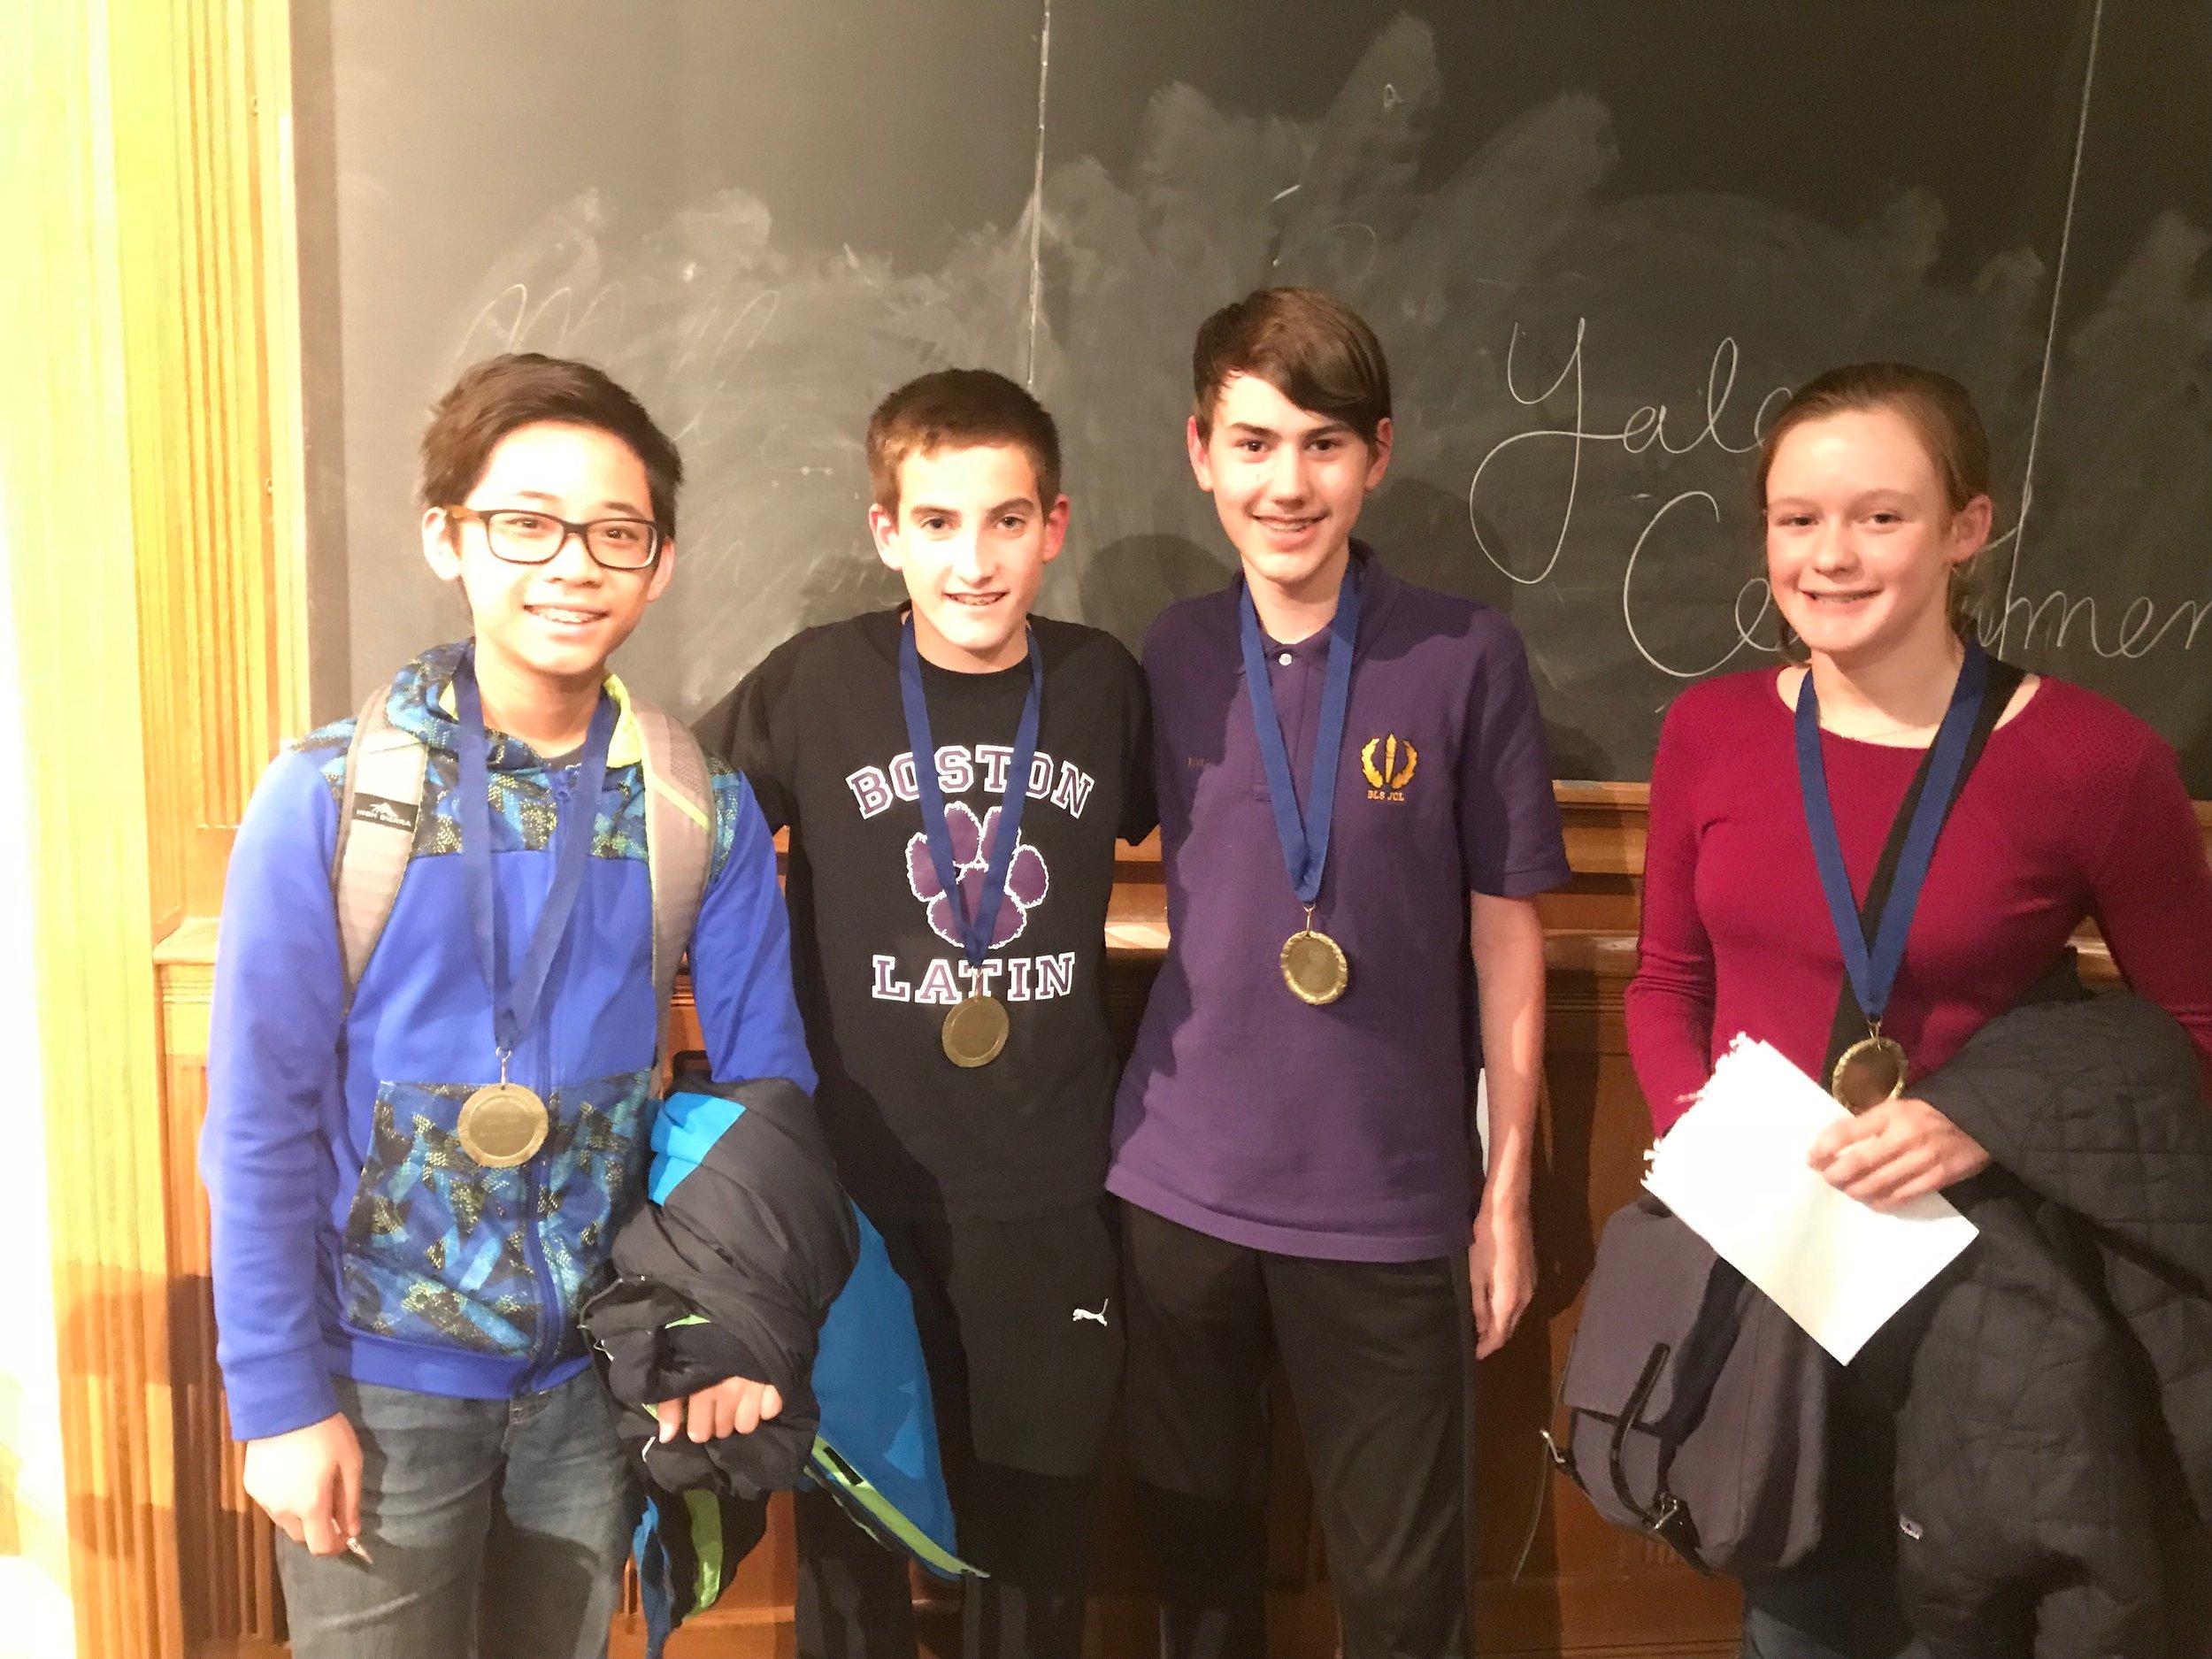 Boston Latin School 1 (MA) - First place, novice division